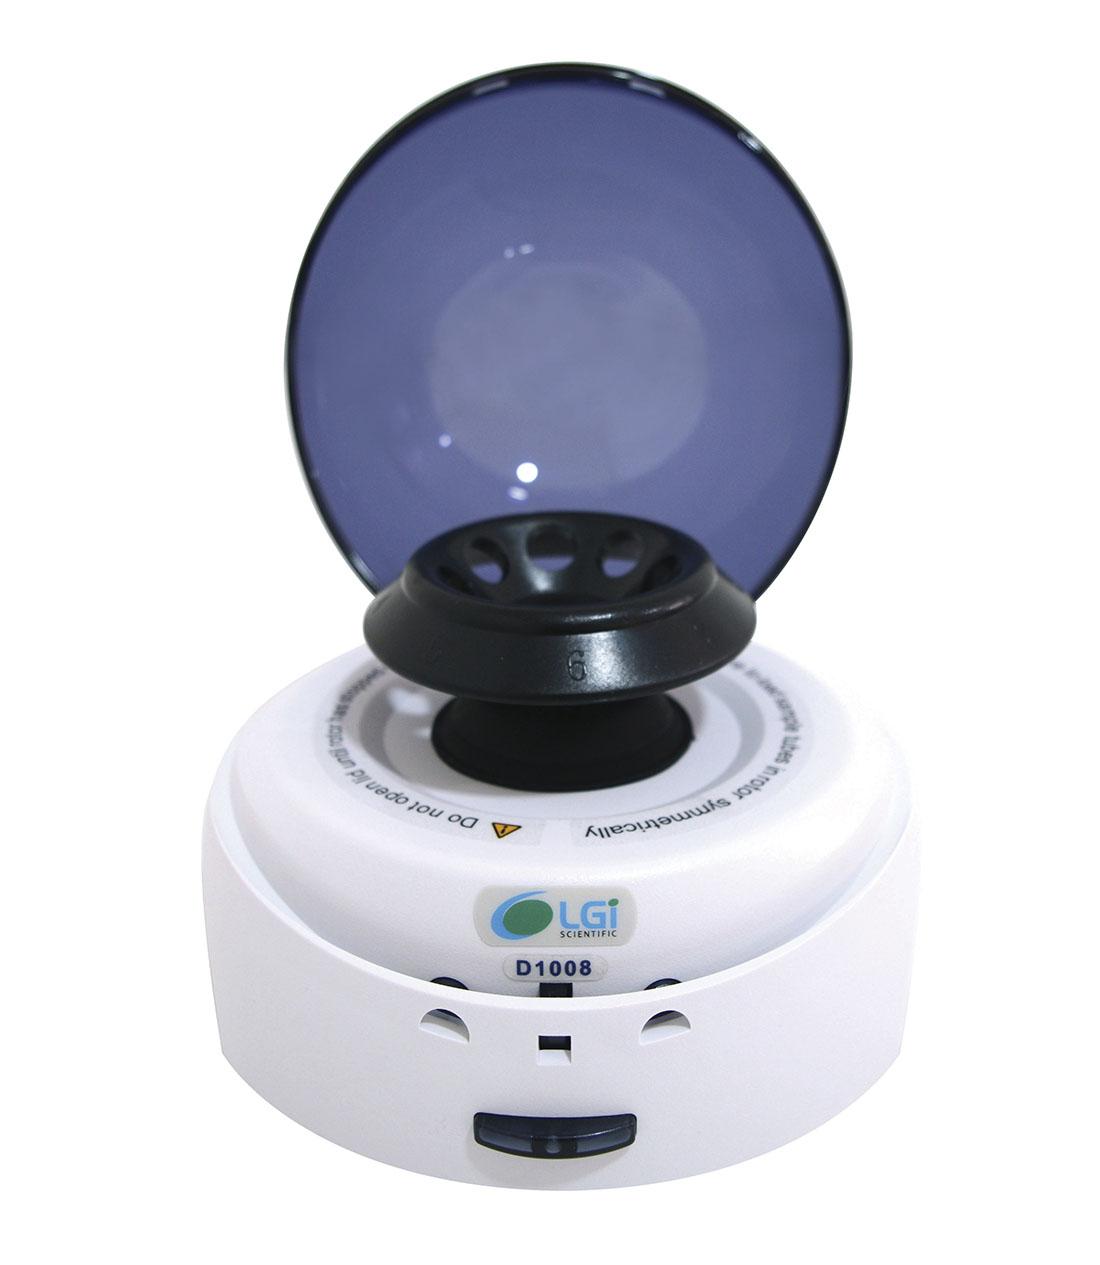 MICROCENTRIFUGA TAMPA AZUL  7000 RPM - LGI SCIENTIFIC - Cód. LGI-MC-1008B